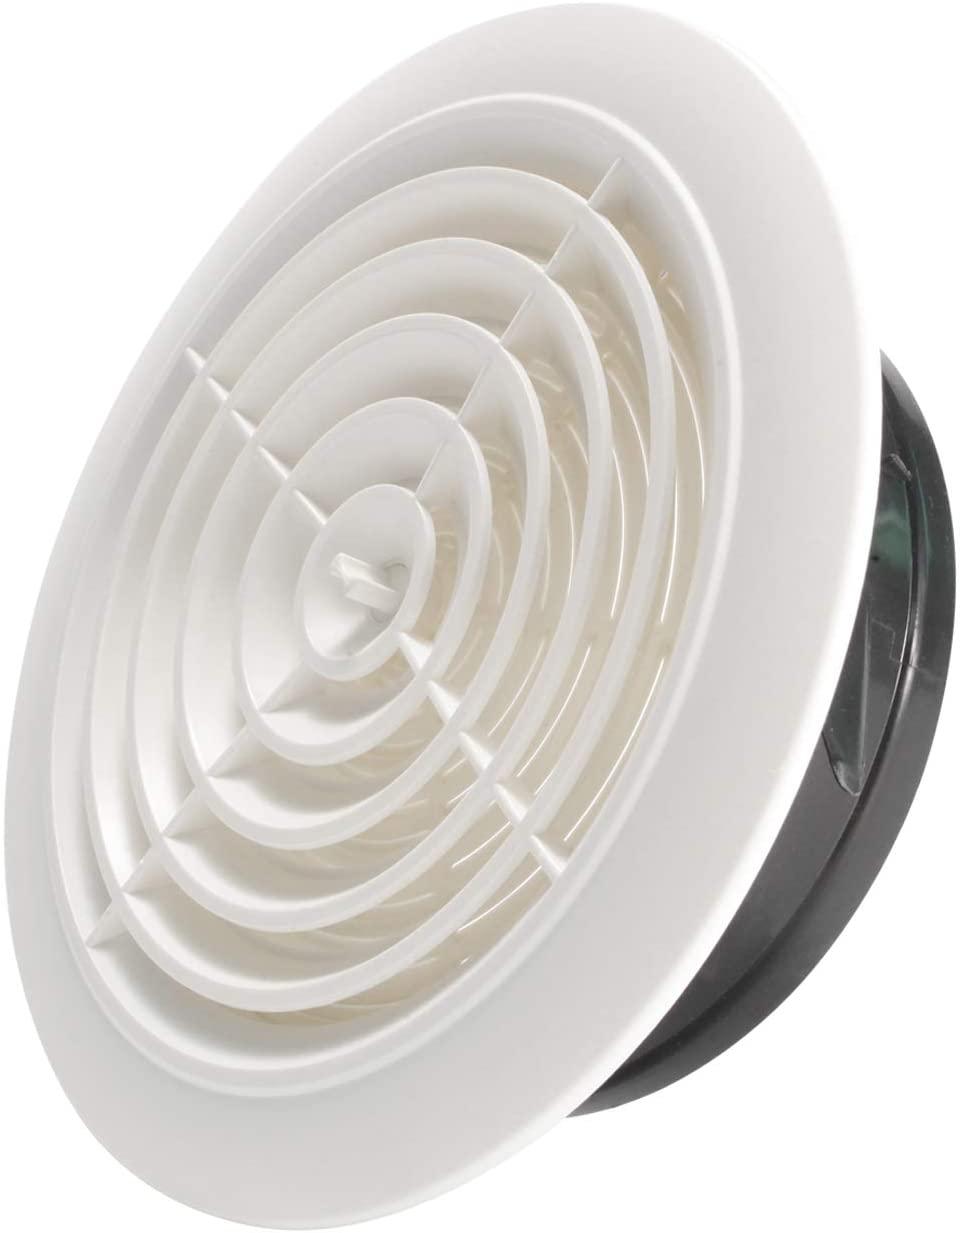 Hon&Guan 8'' Air Vent Air Grill Cover for Bathroom Office Home etc (ø200mm)